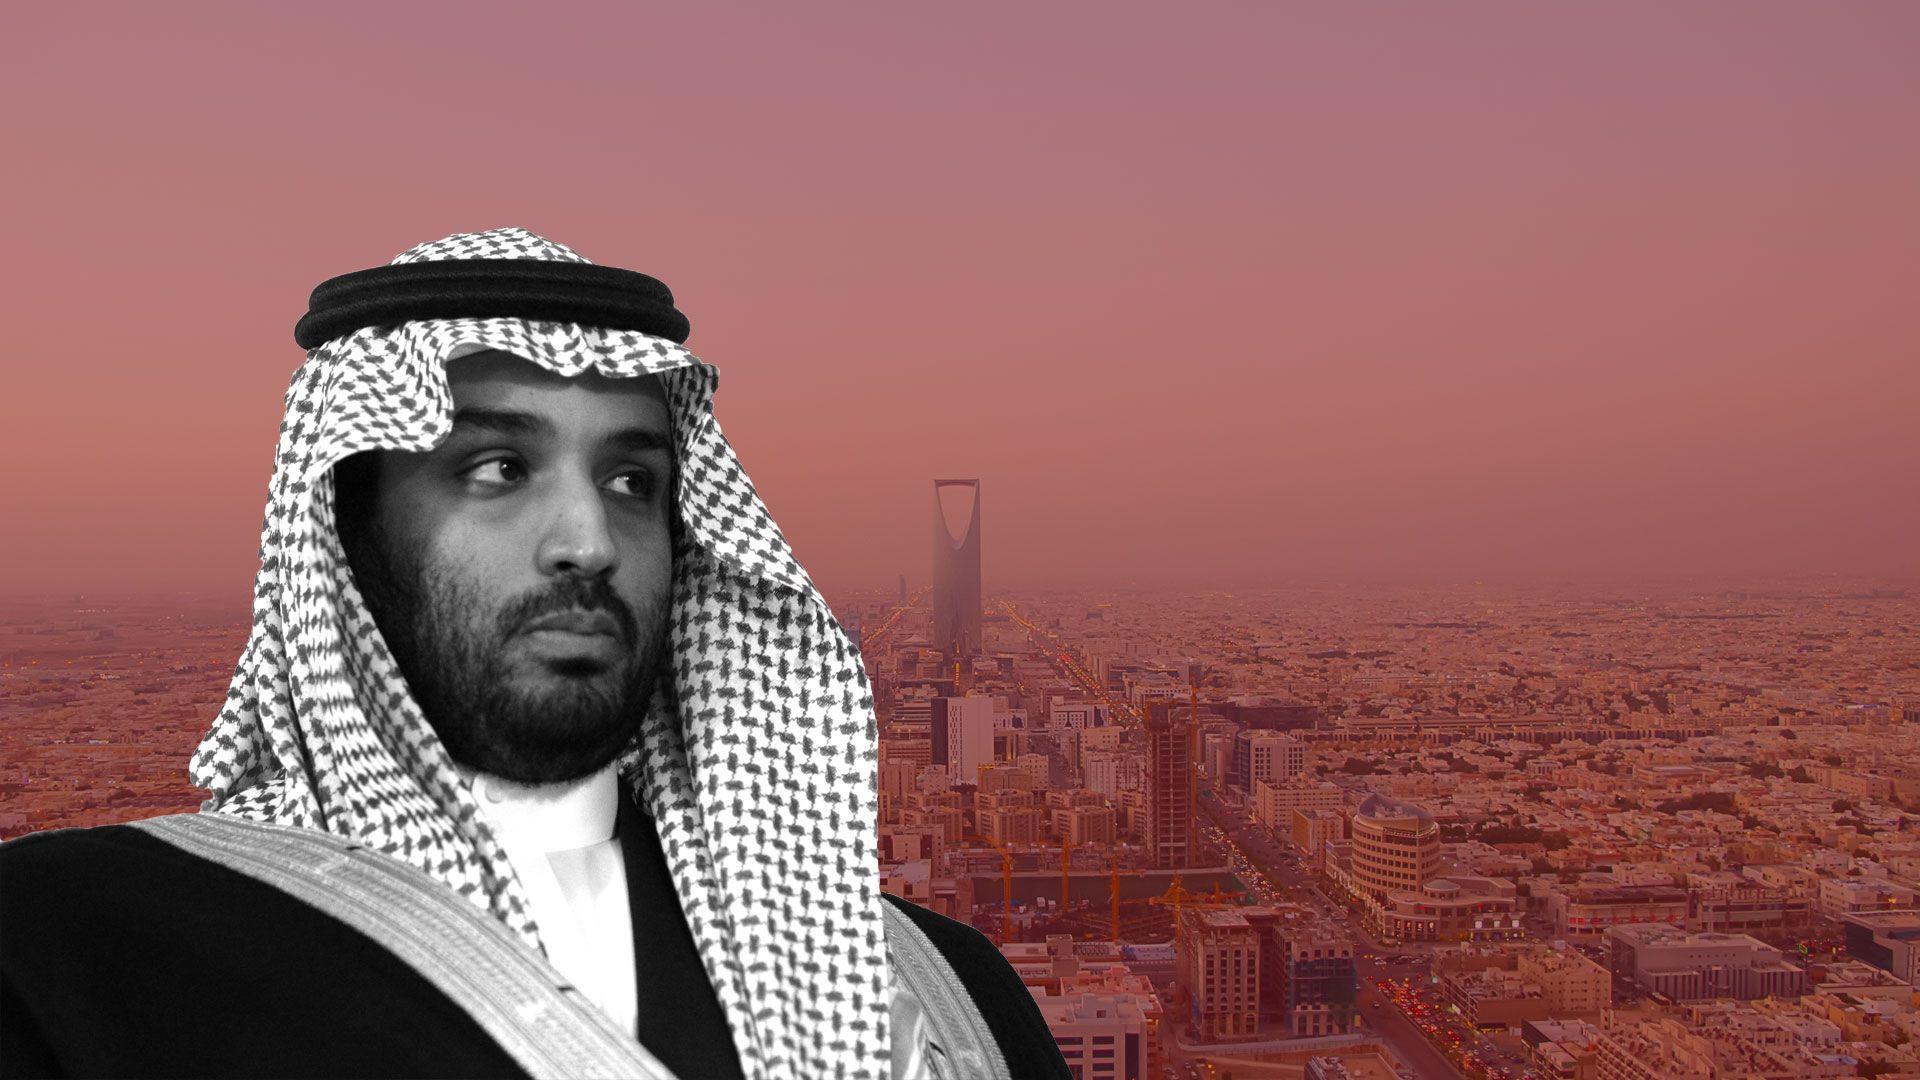 Mohammed Bin Salman over a filtered photo of Riyadh